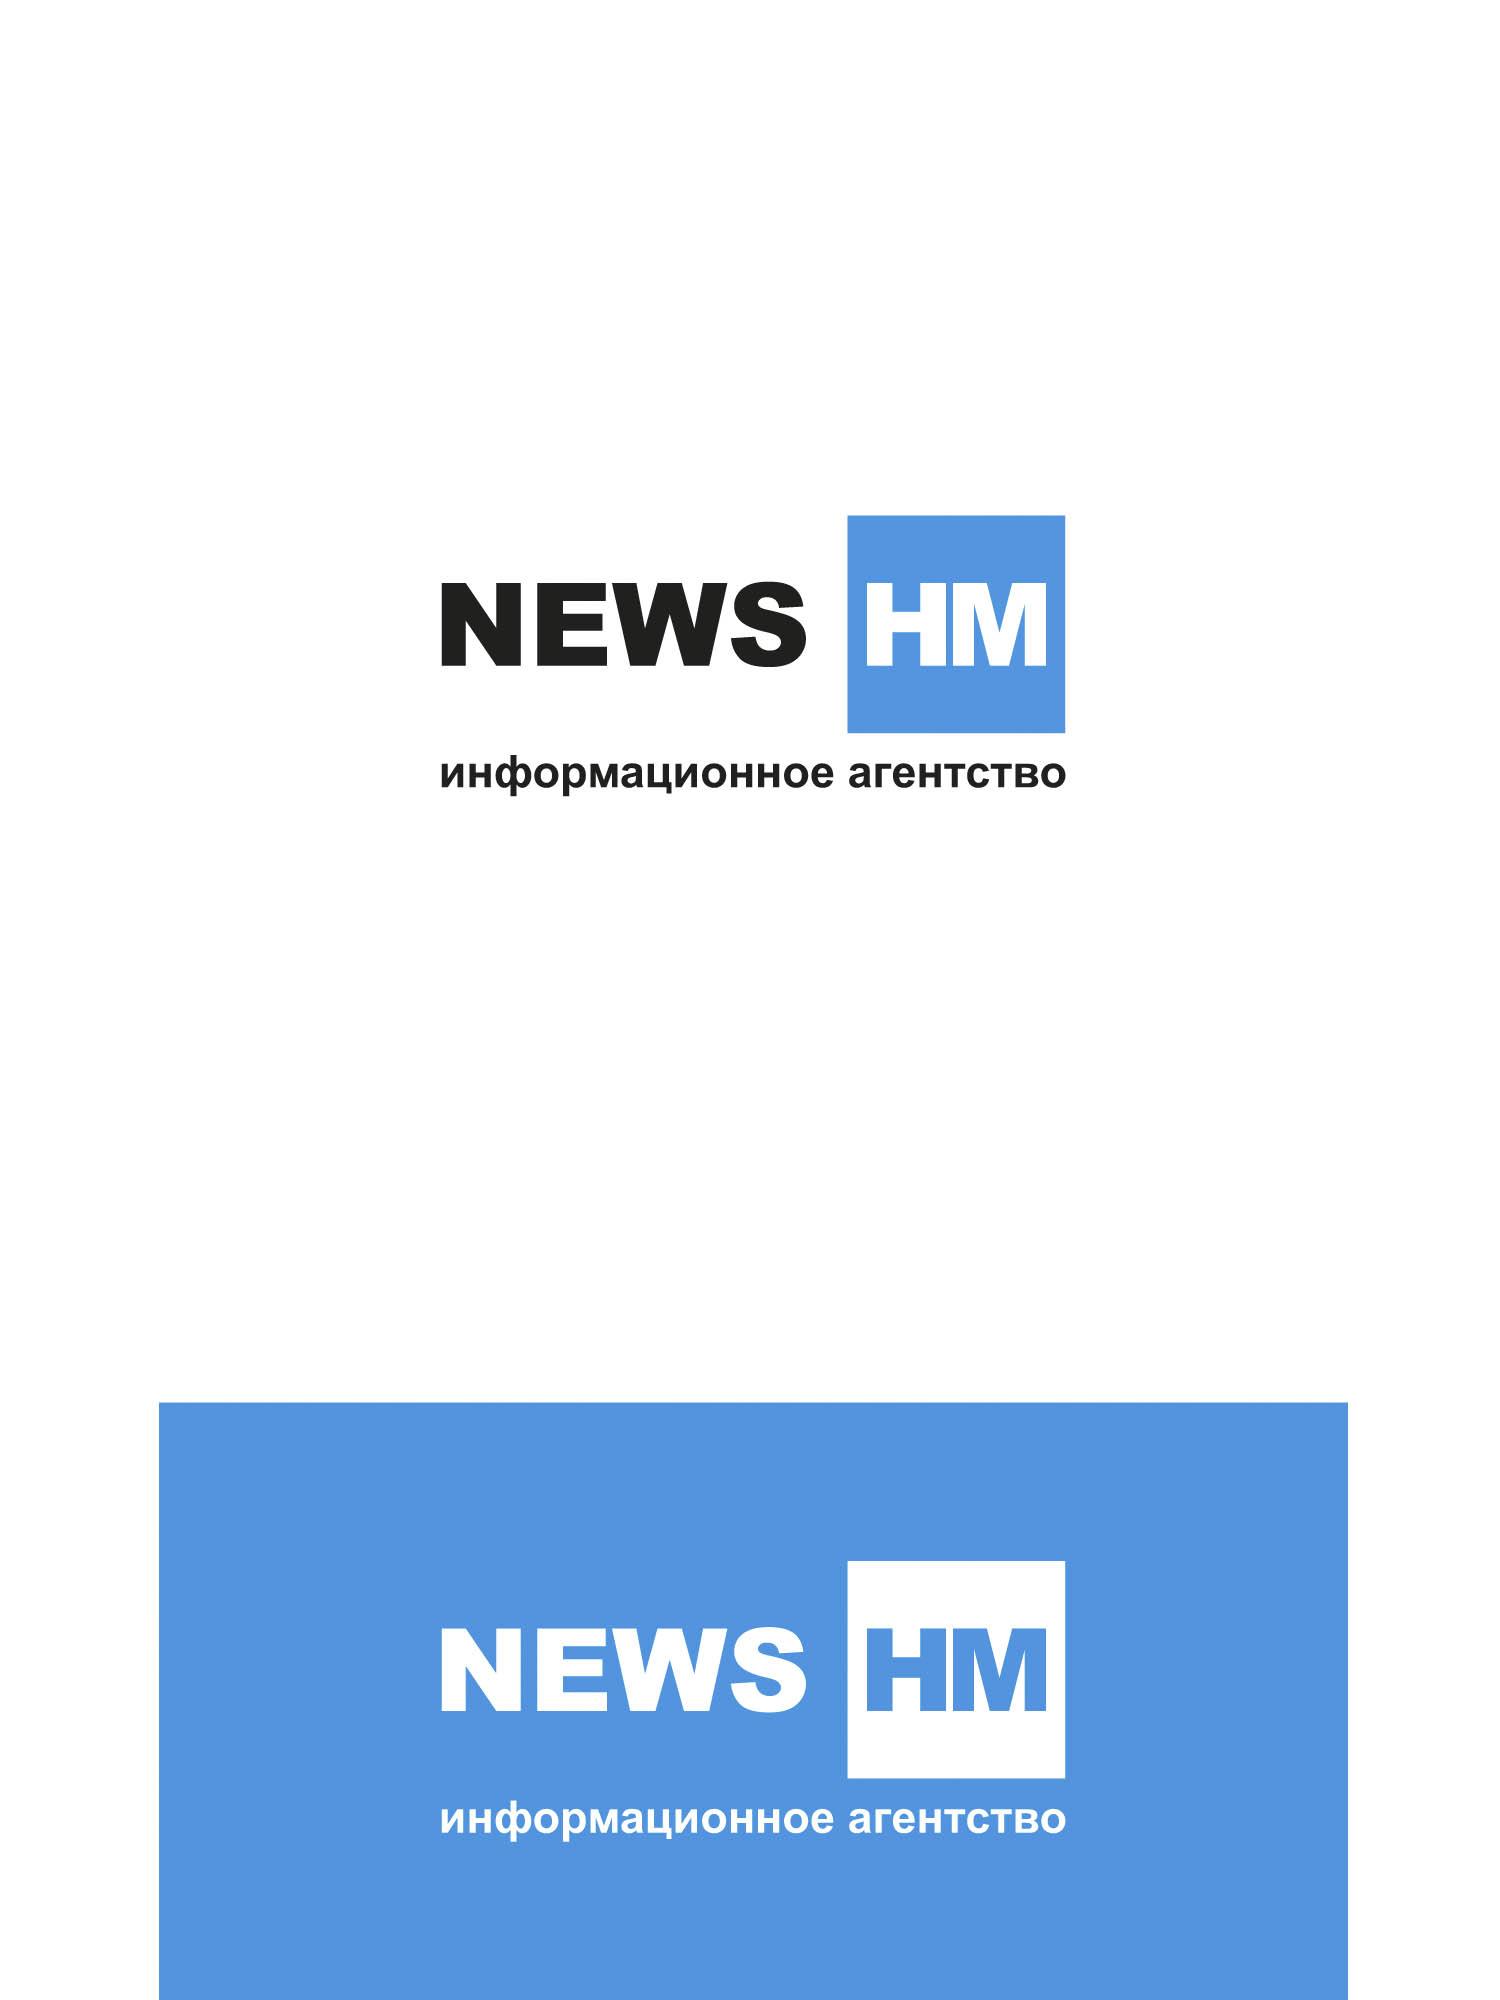 Логотип для информационного агентства фото f_8835aa517b195609.jpg